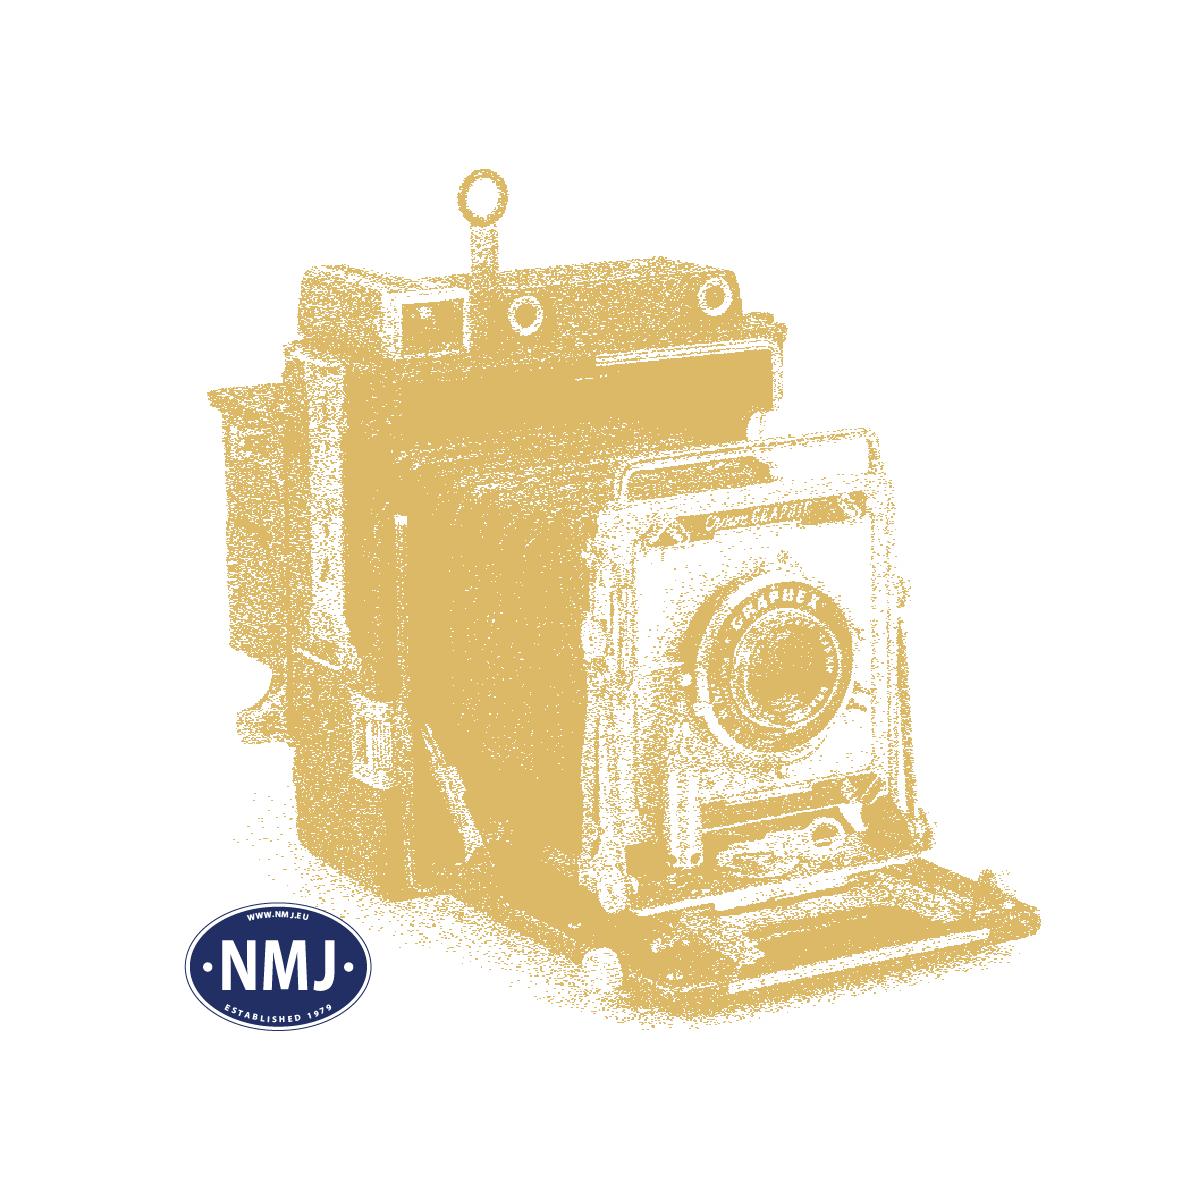 NMJS21c372 - NMJ Superline NSB Type 21c 372